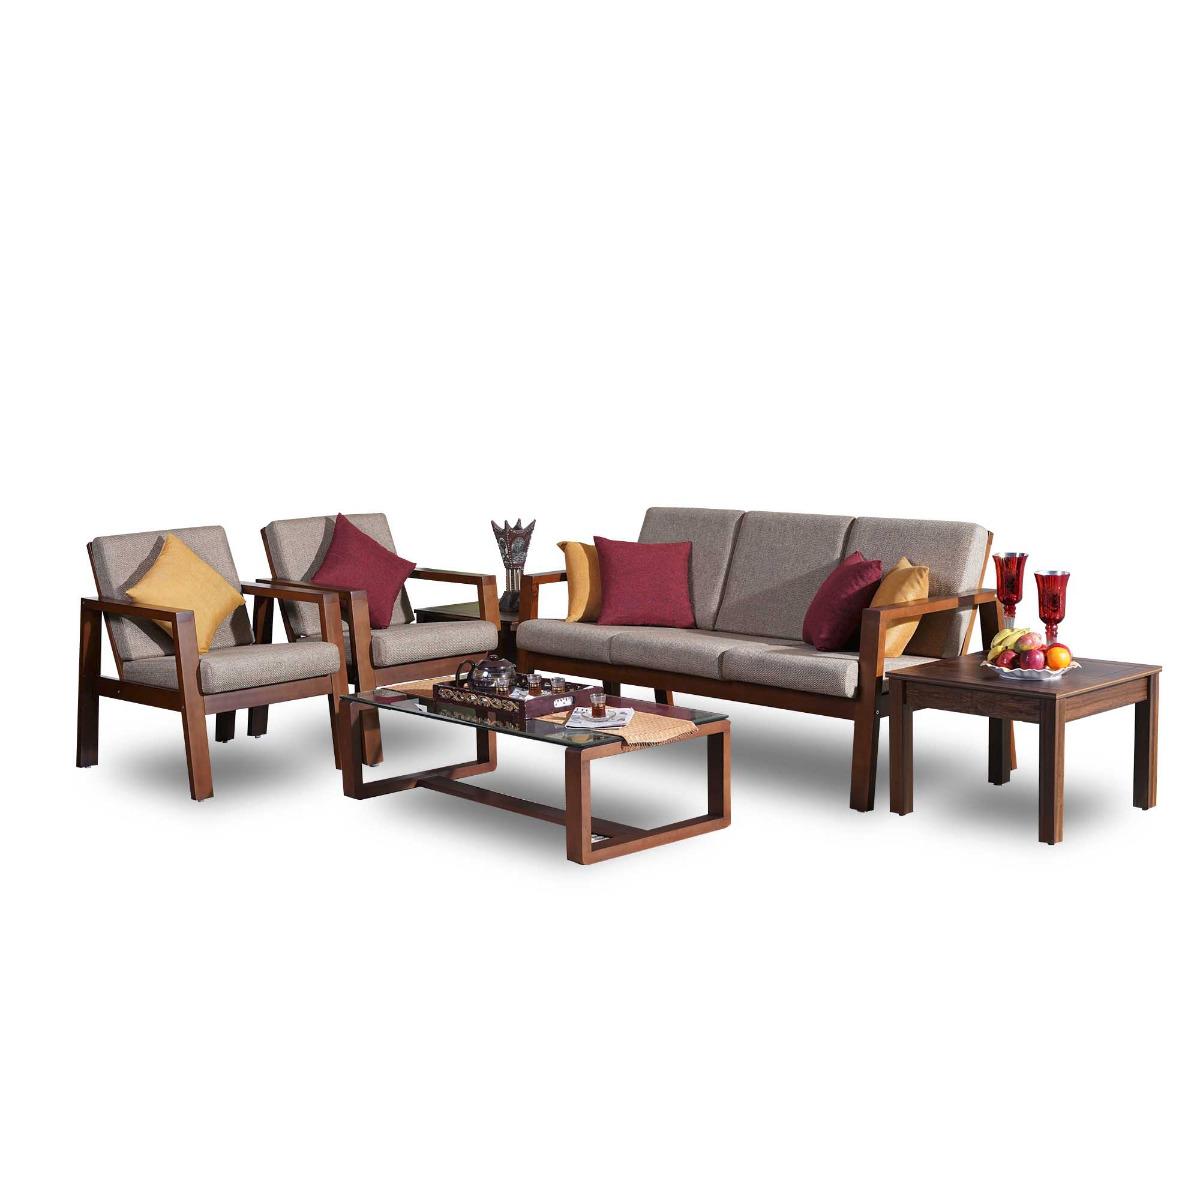 Miraculous Furniture Shops In Kerala Stores In Chennai Jacfurn Machost Co Dining Chair Design Ideas Machostcouk